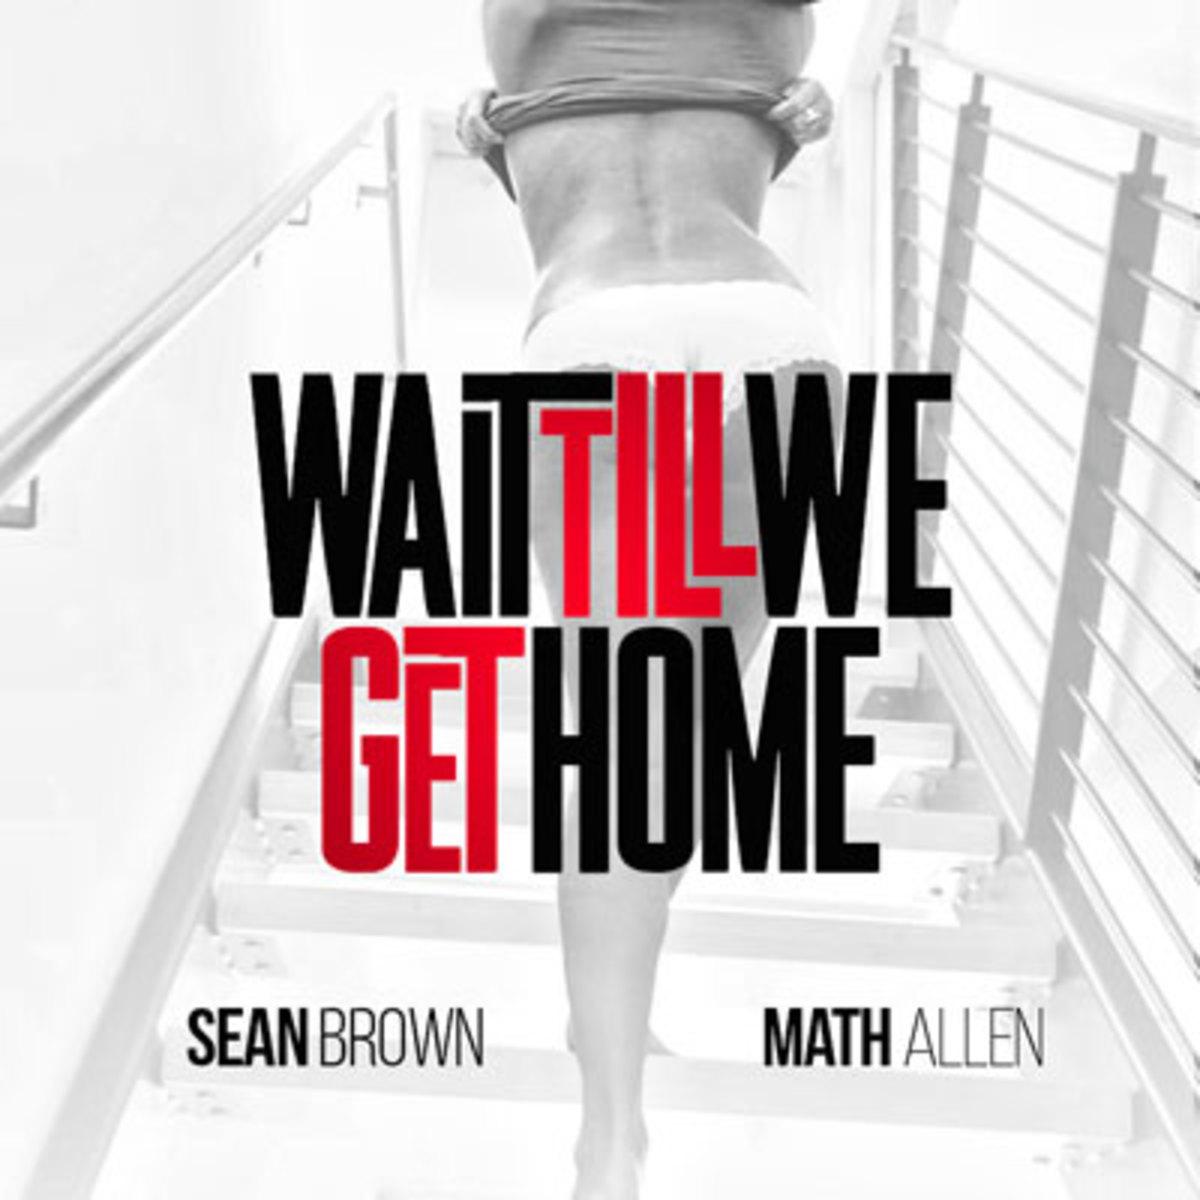 seanbrown-waittill.jpg